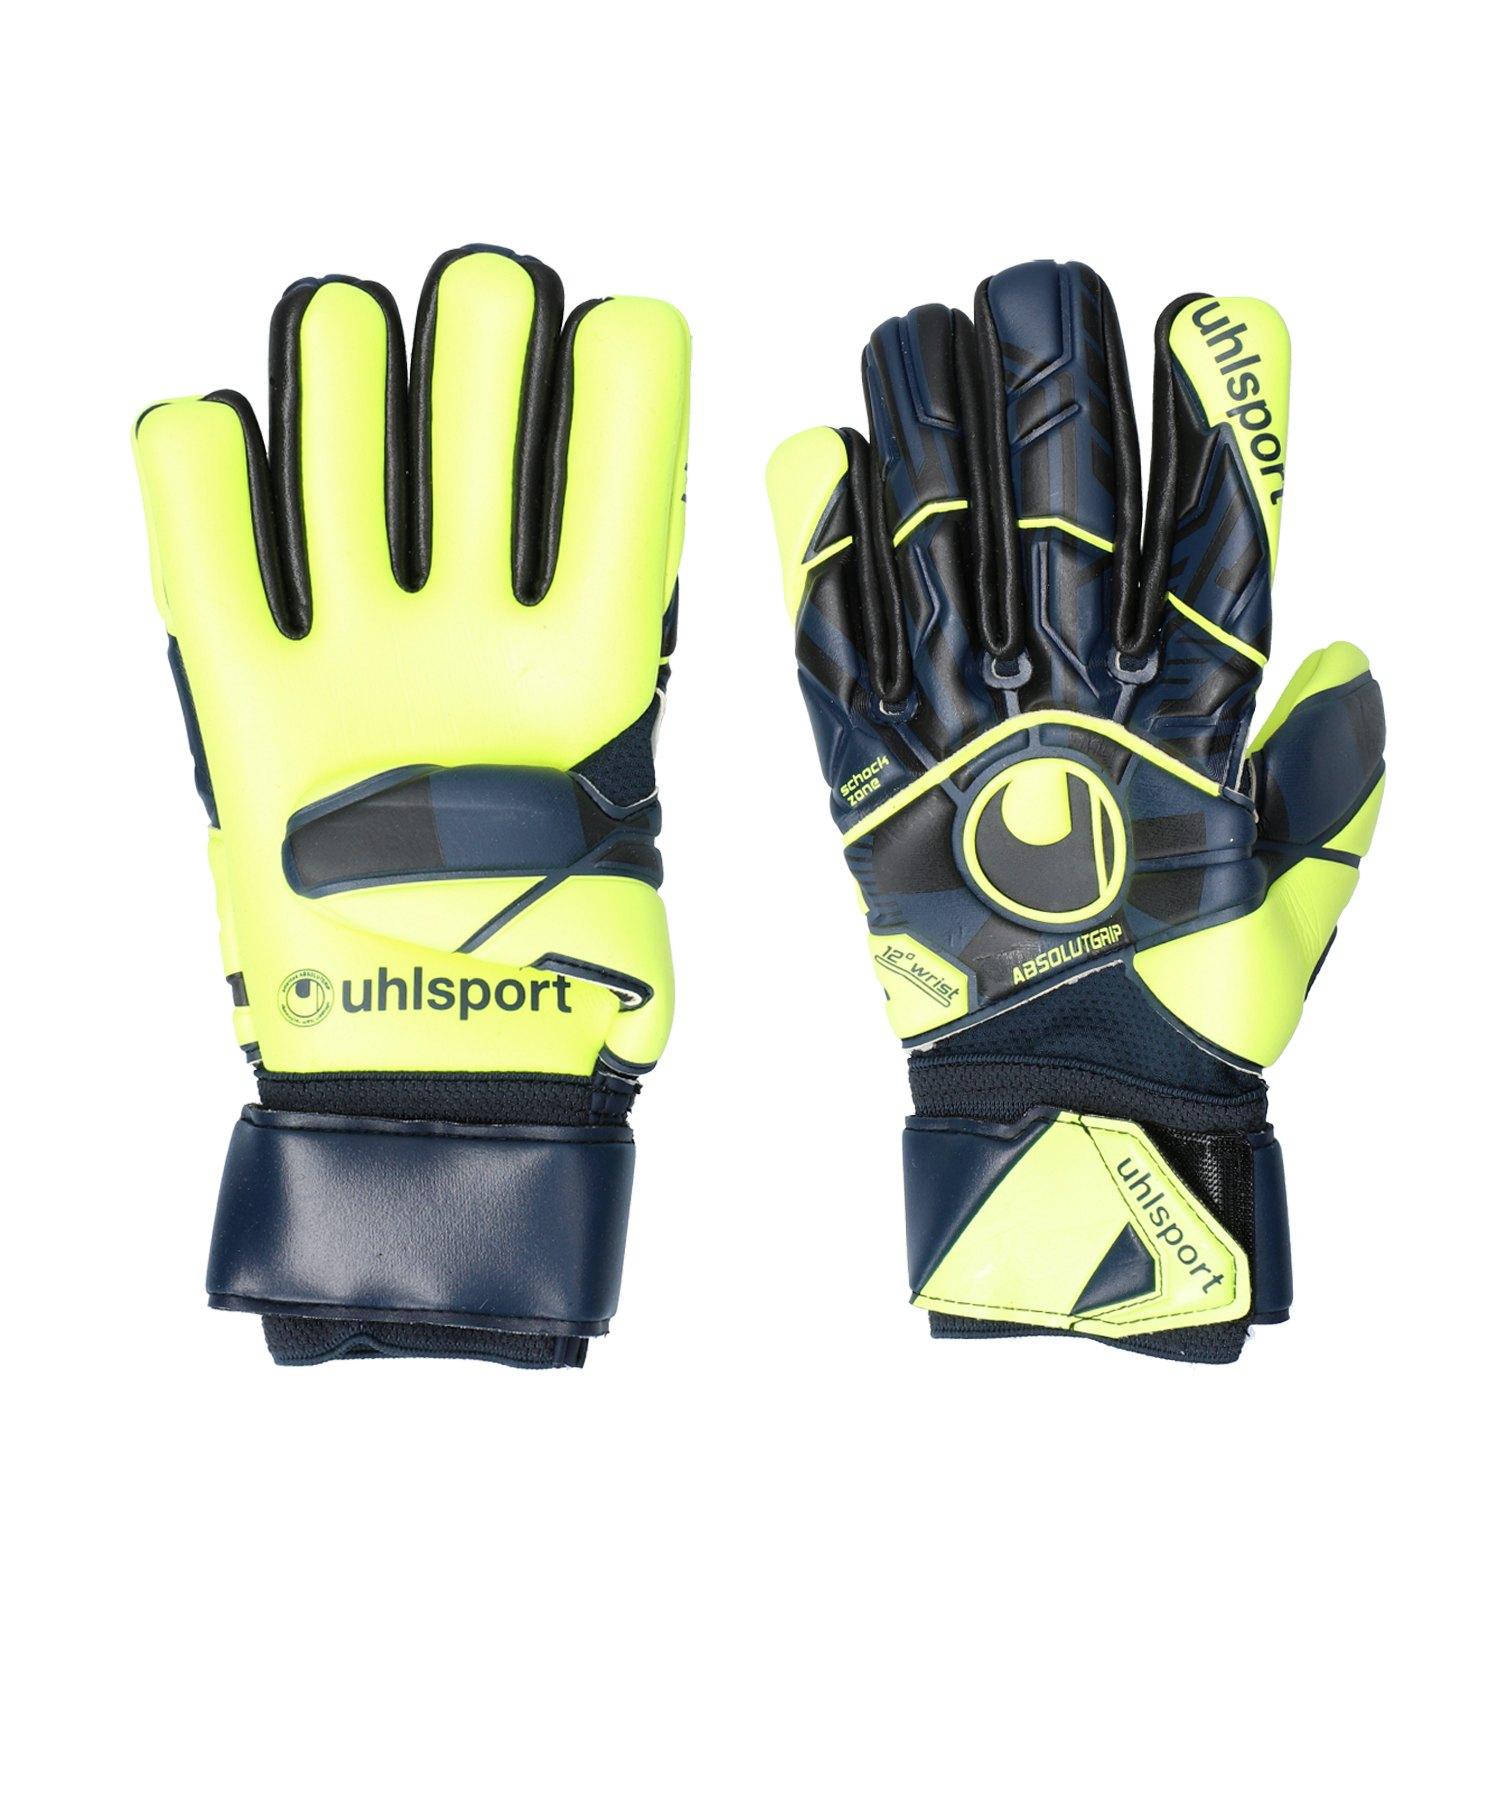 Uhlsport Absolutgrip JR PRO HN TW-Handschuh F03 - gelb